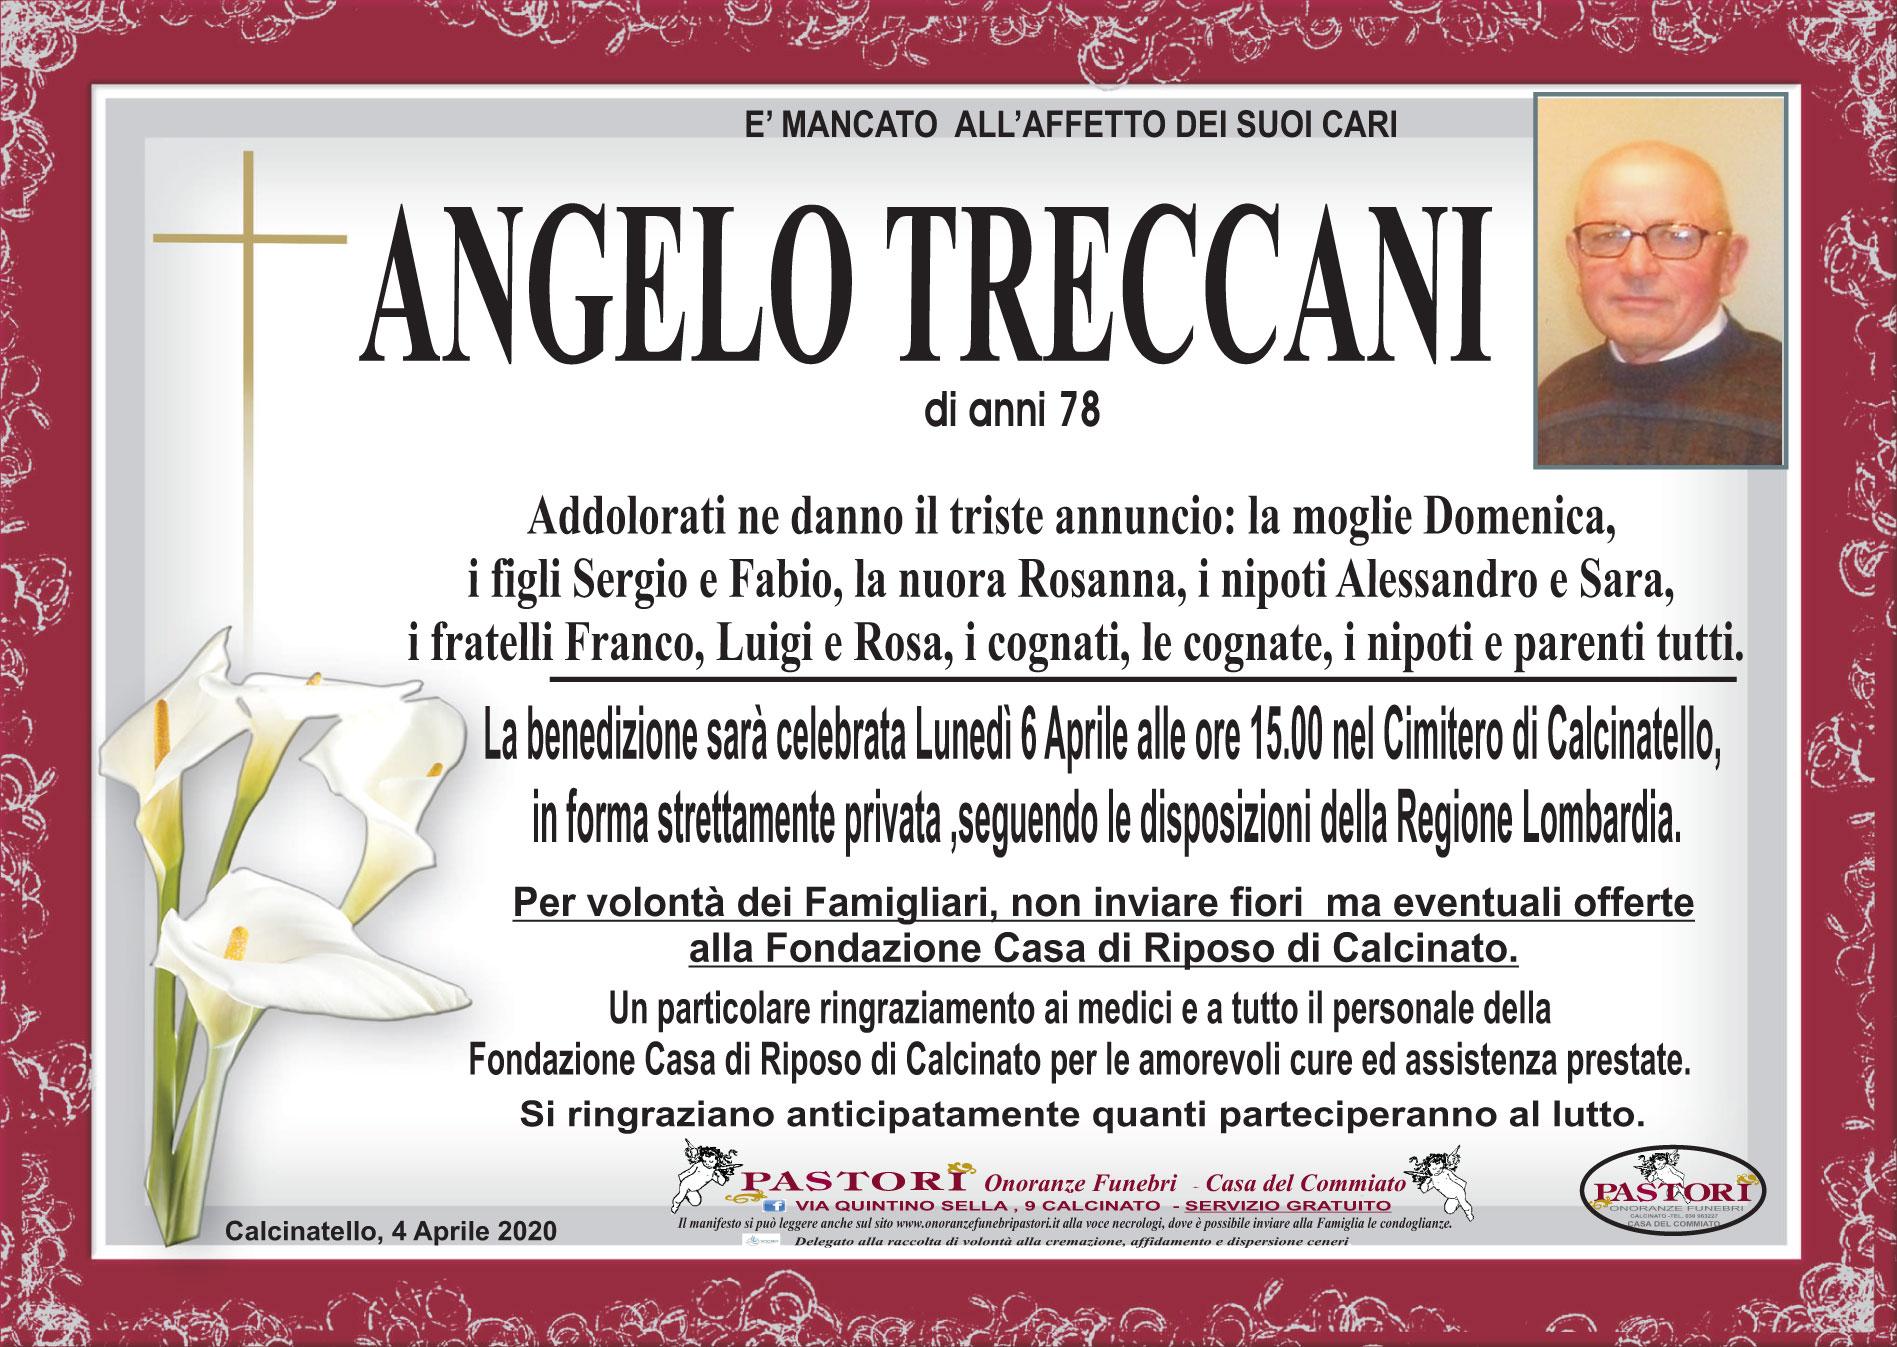 Angelo Treccani